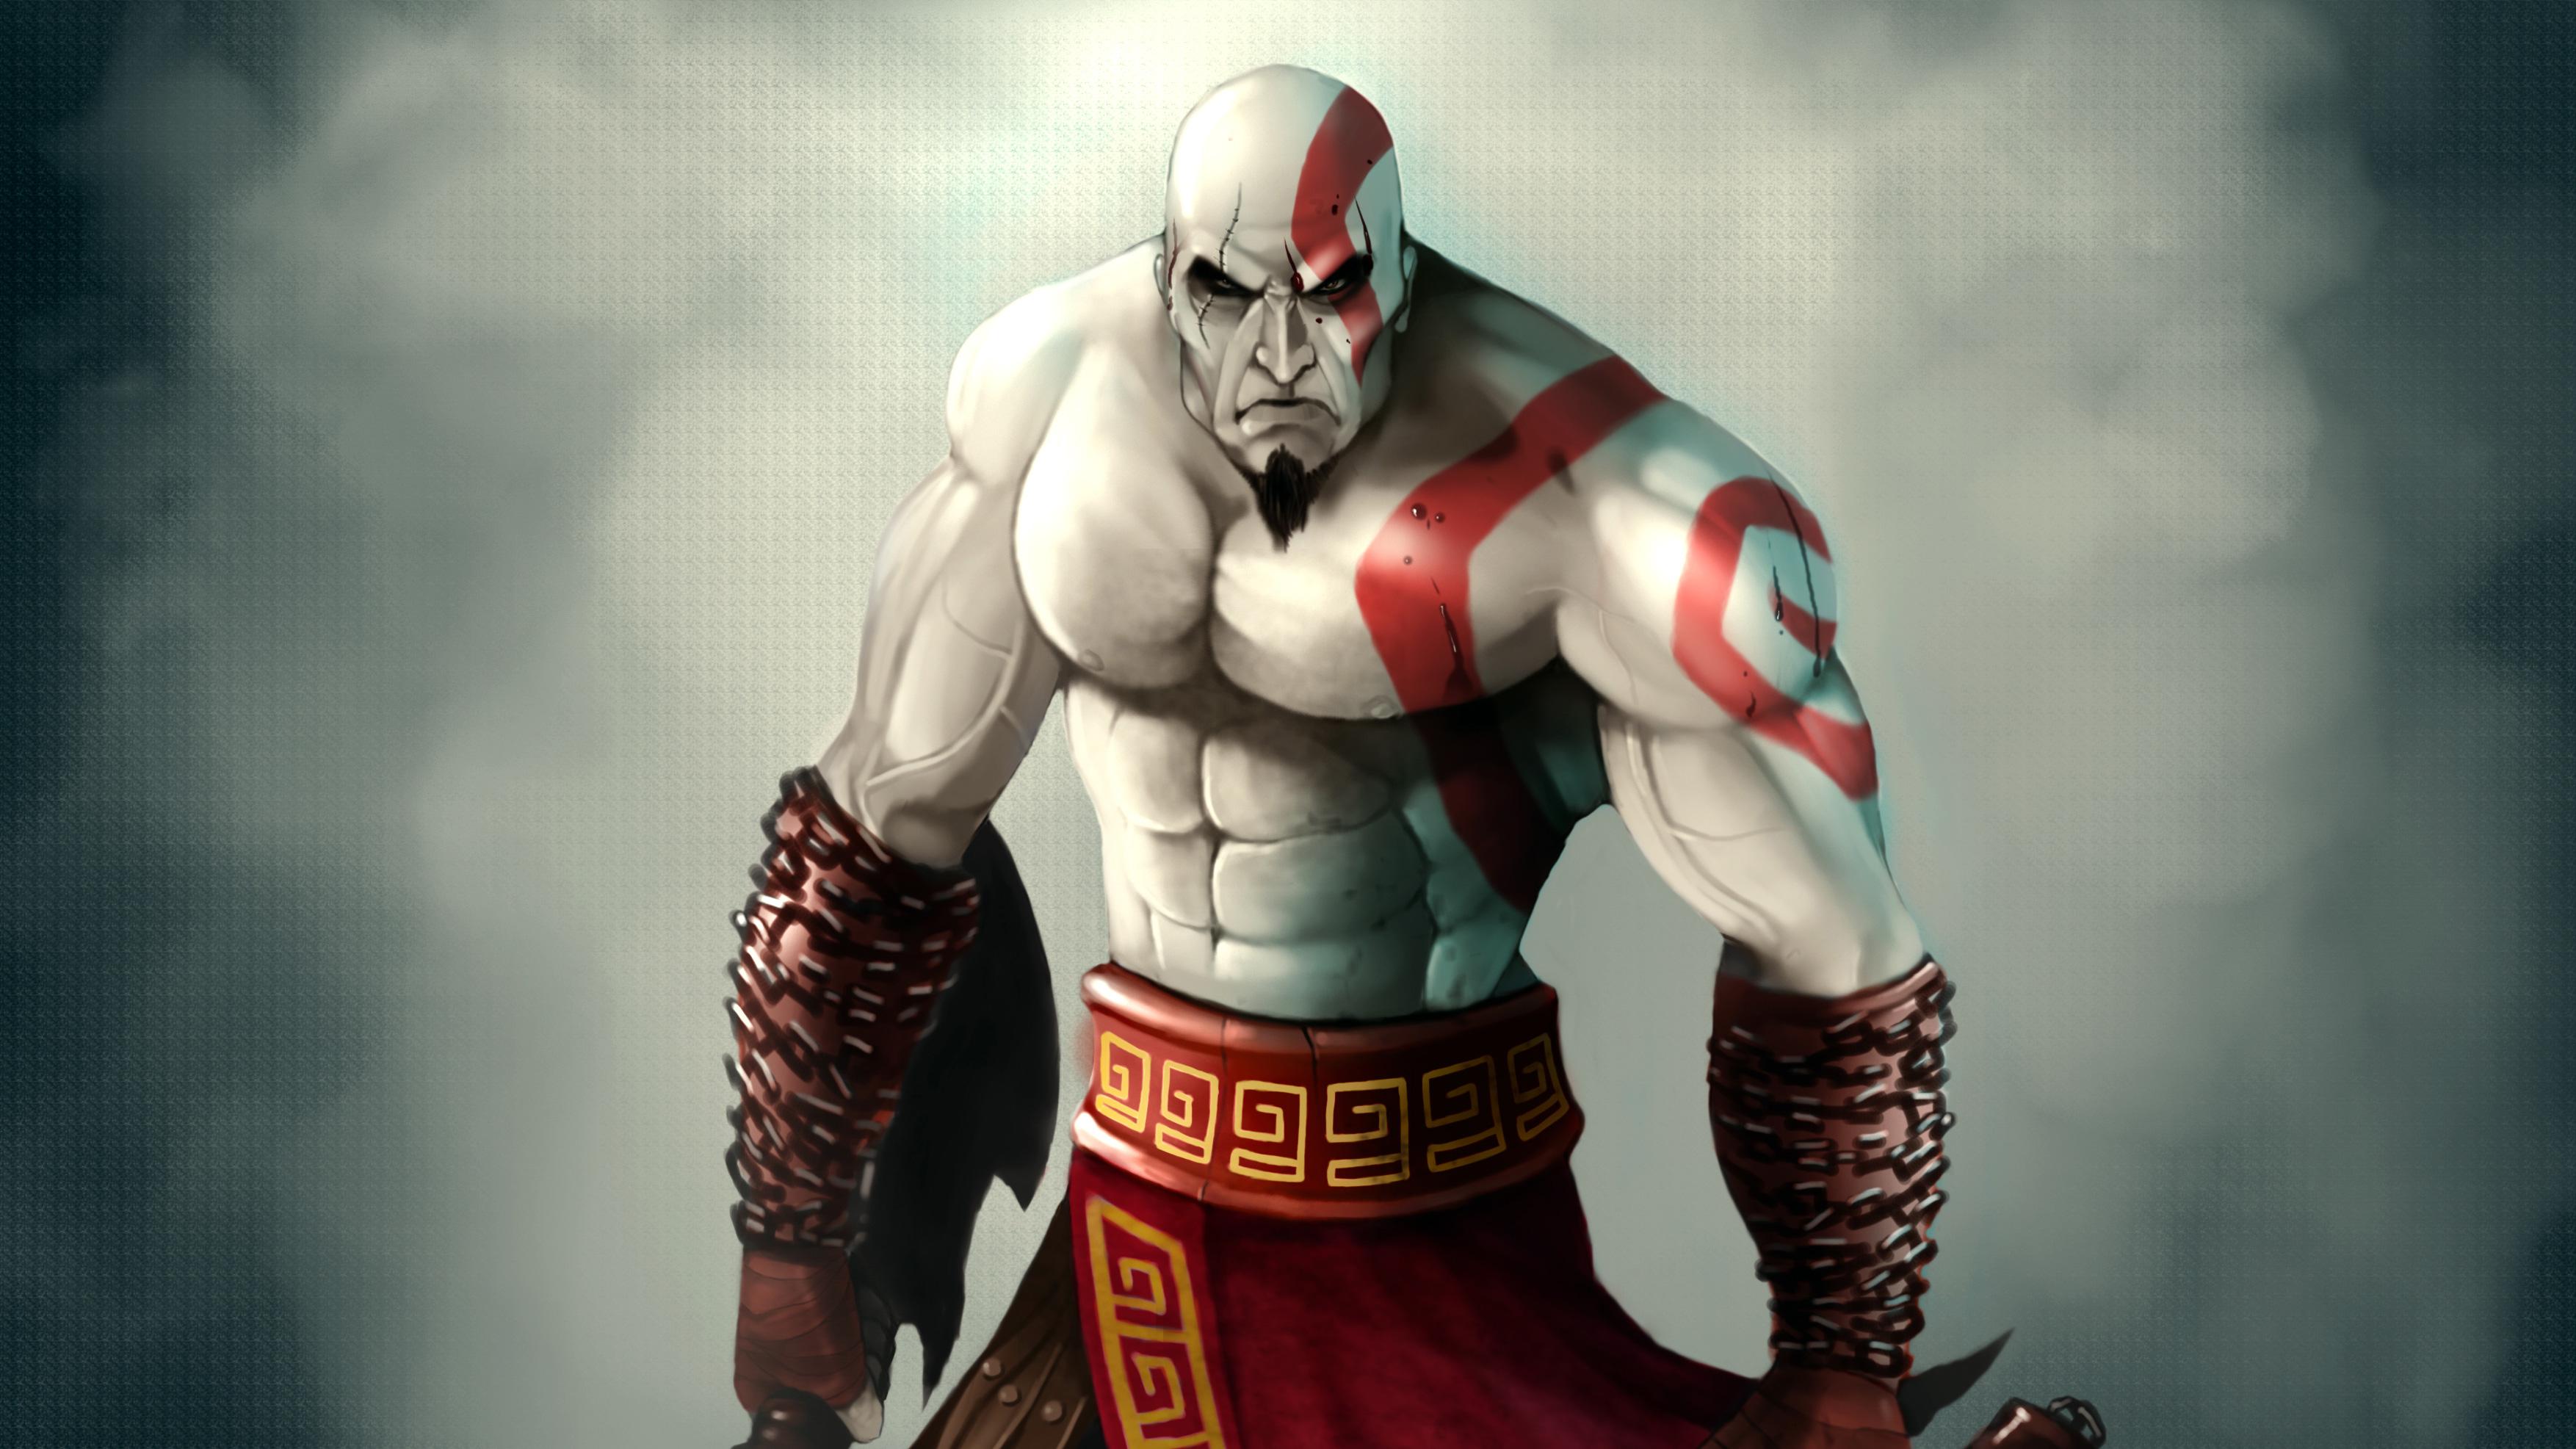 Kratos God Of War 4k Art Hd Games 4k Wallpapers Images